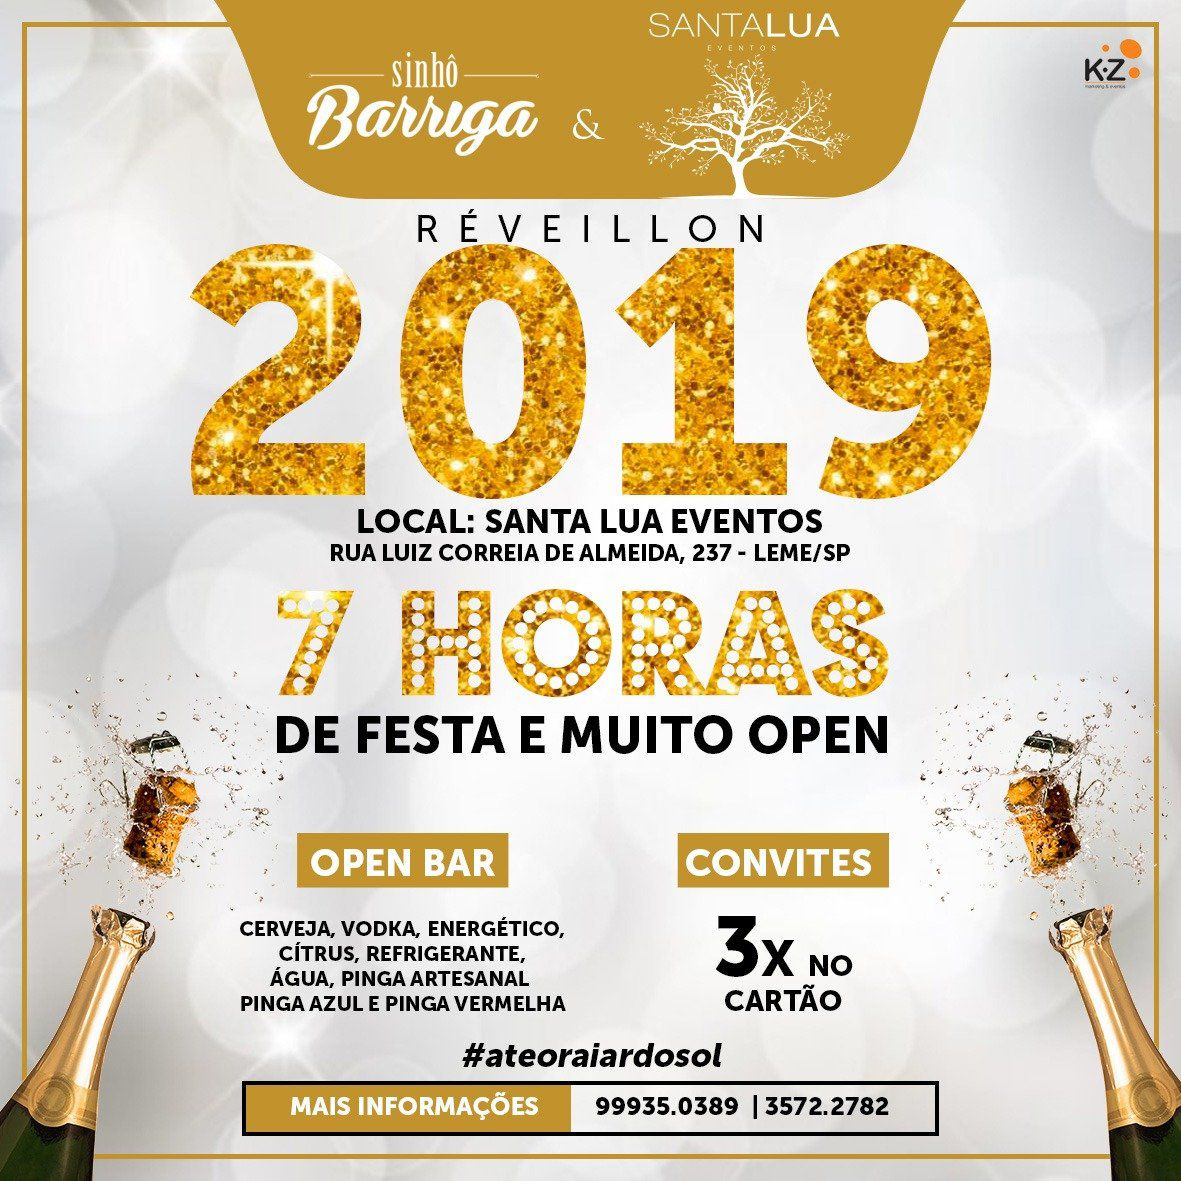 Réveillon 2019 - Sinhô Barriga - 31/12/18 - Leme - SP